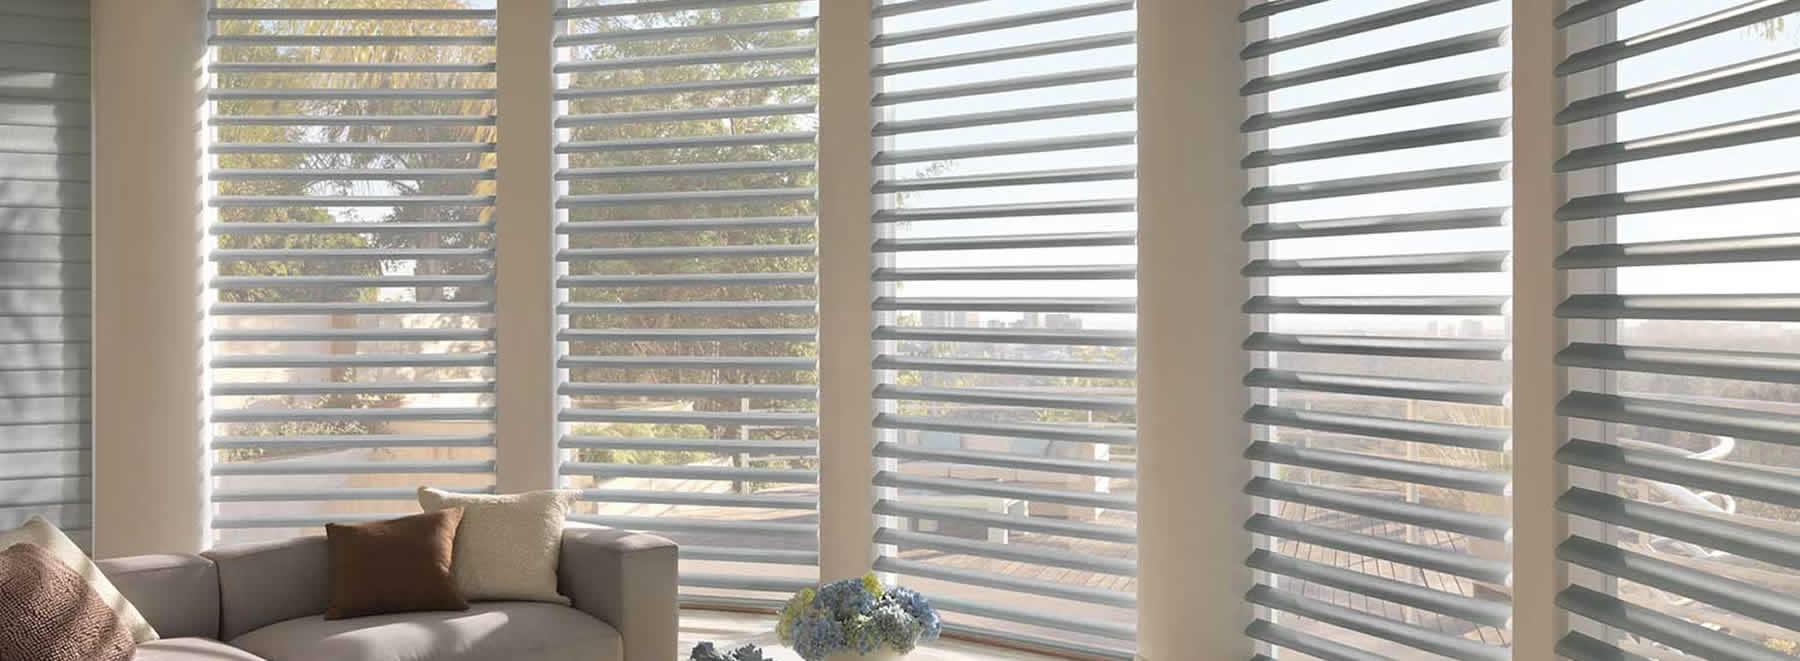 Get HunterDouglas blinds and window treatments.